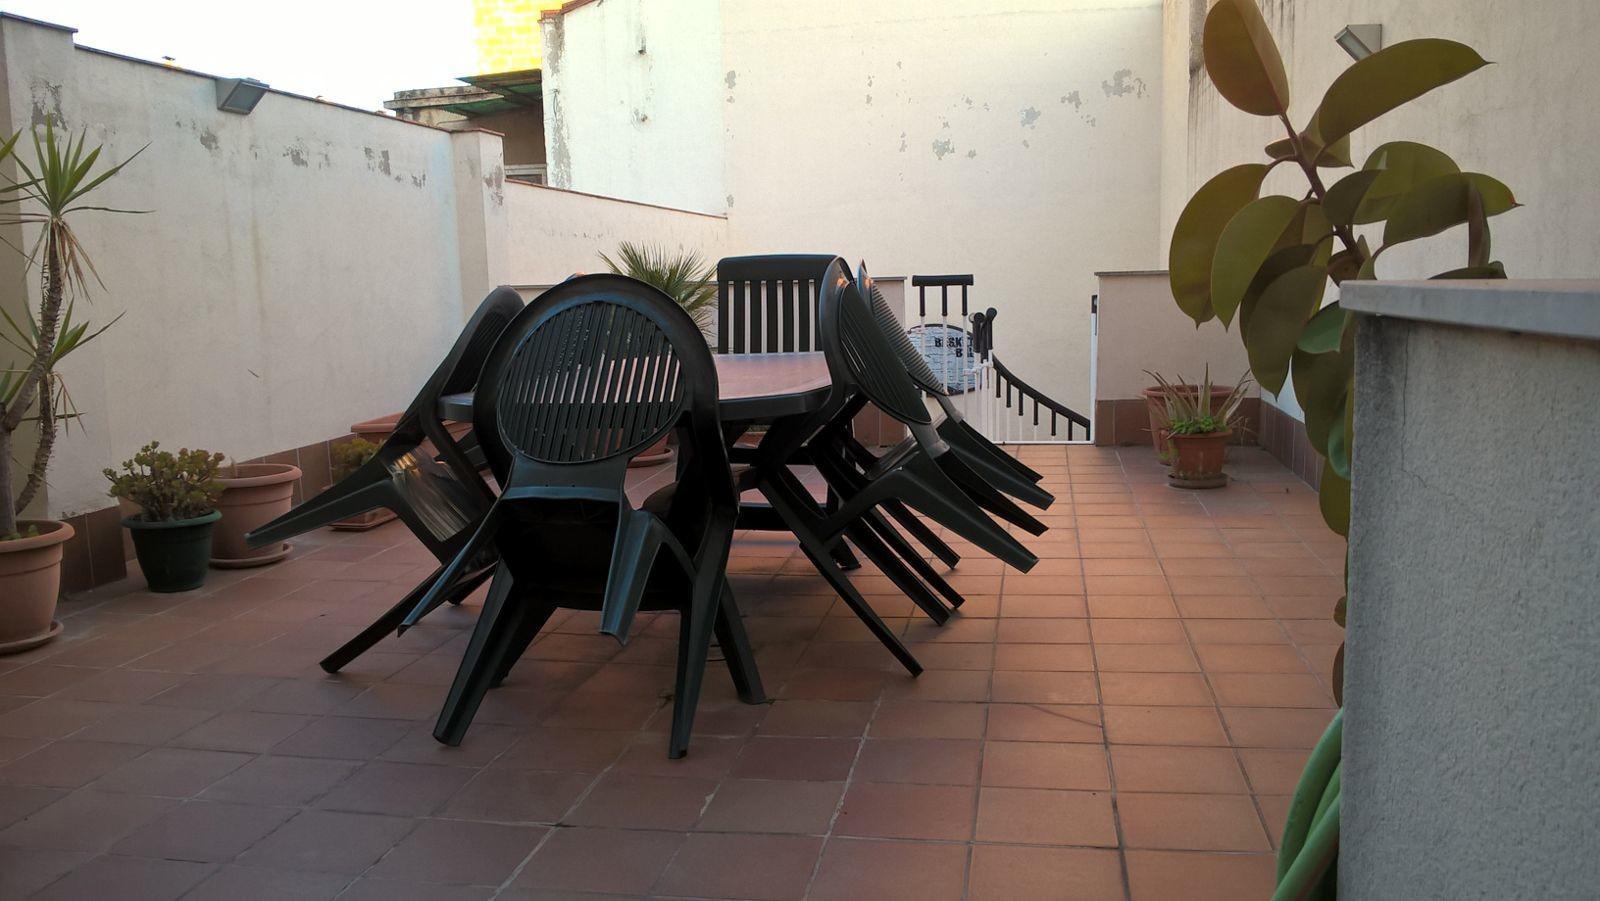 155334 - Cerca del Colegio Ribatallada